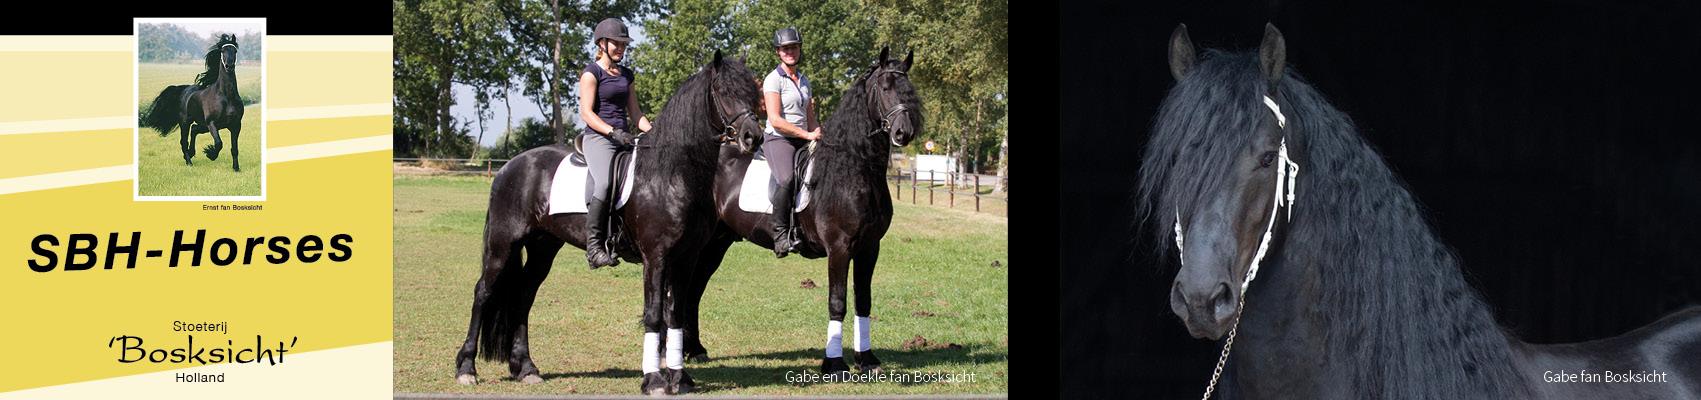 sbhhorses-frisianhorses-slidera7